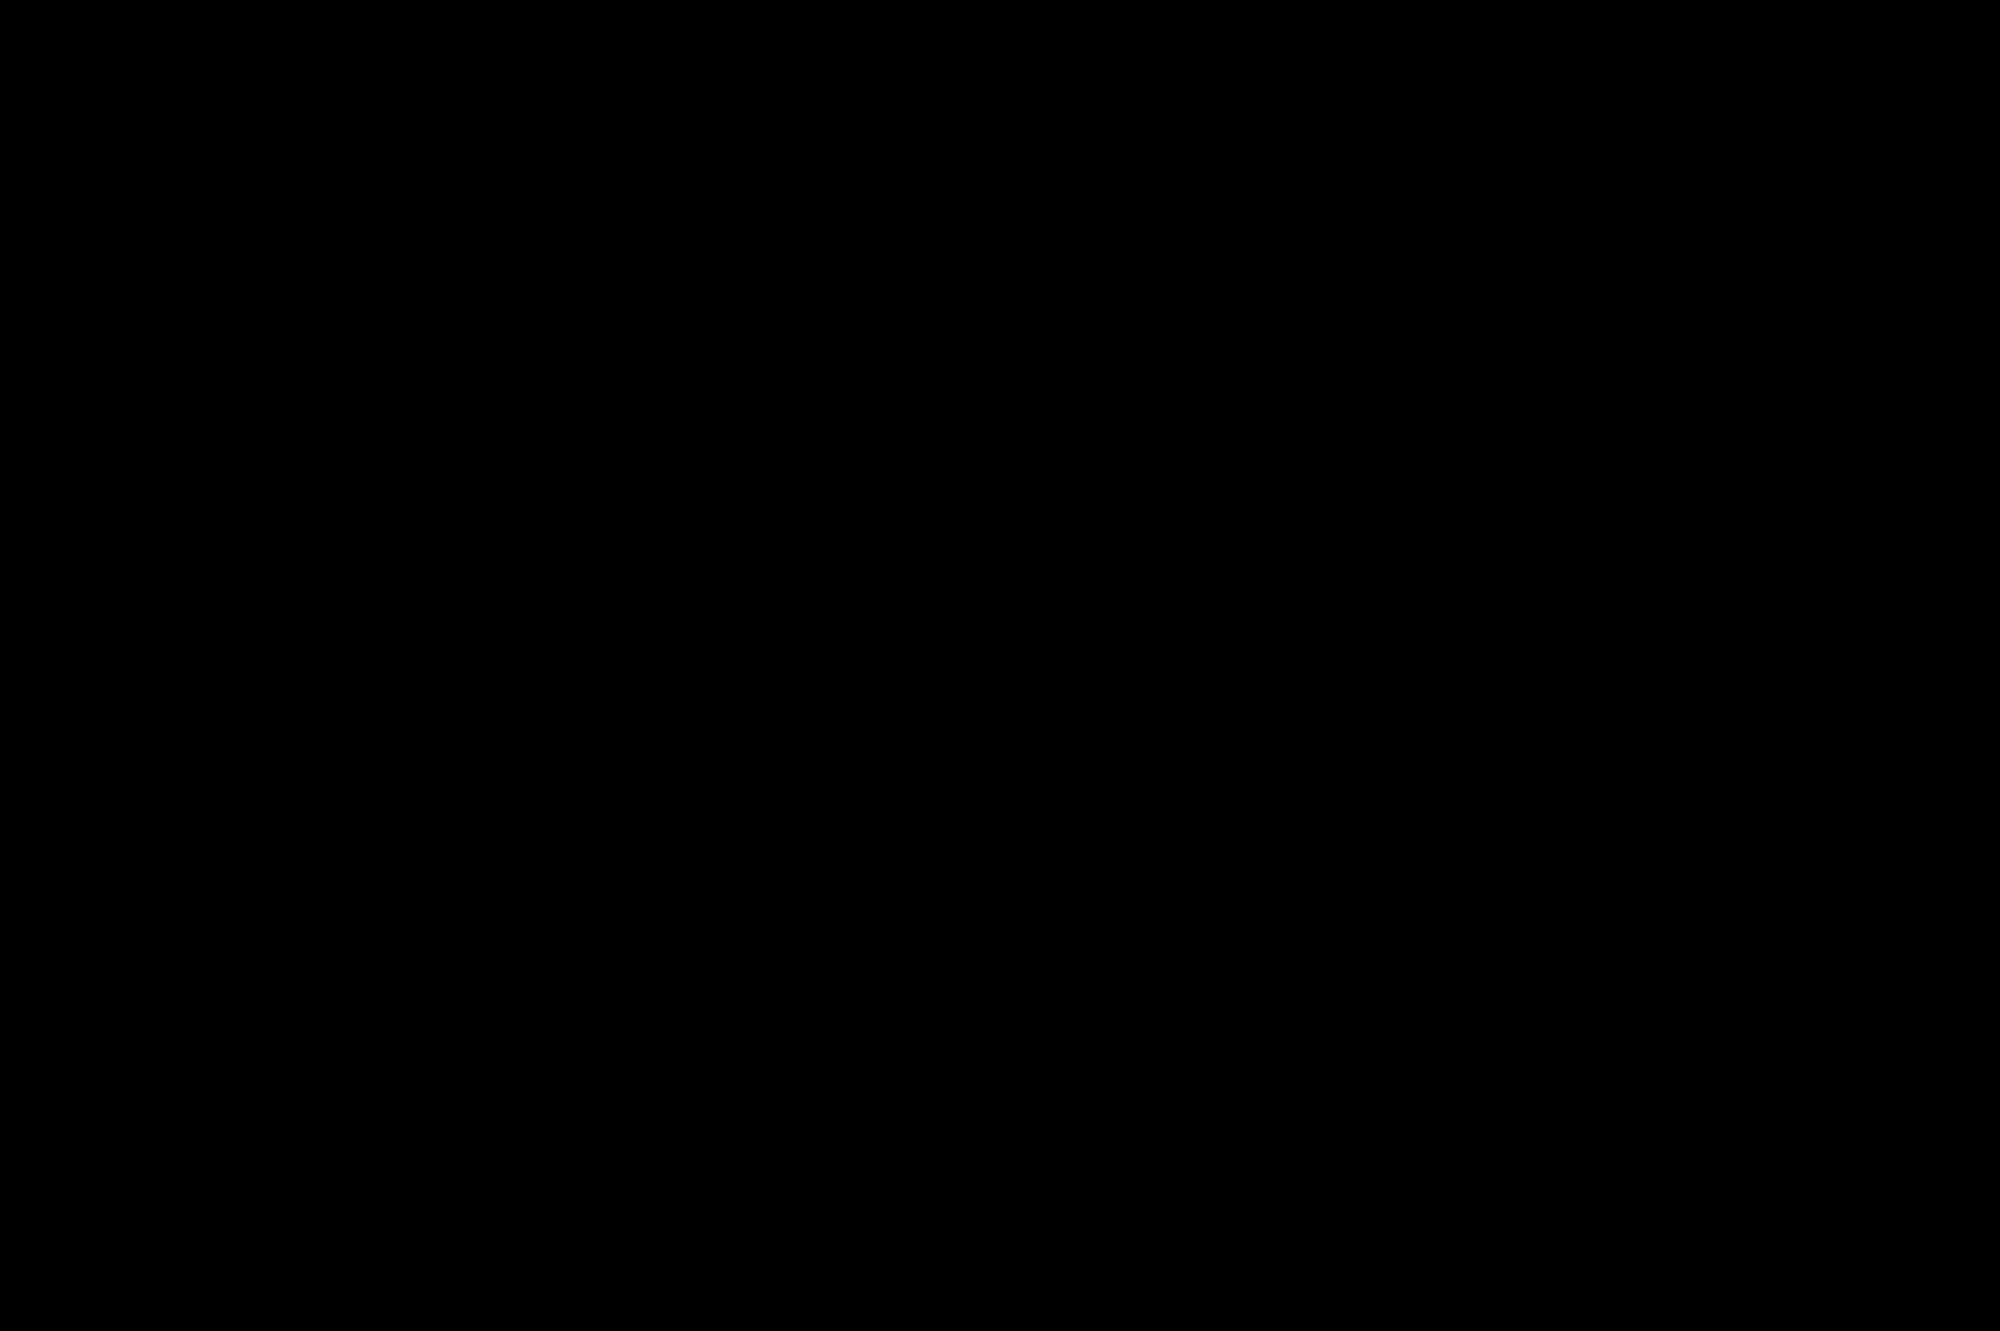 Разработка логотипа для управляющей компании фото f_5175f8311ecd760d.png